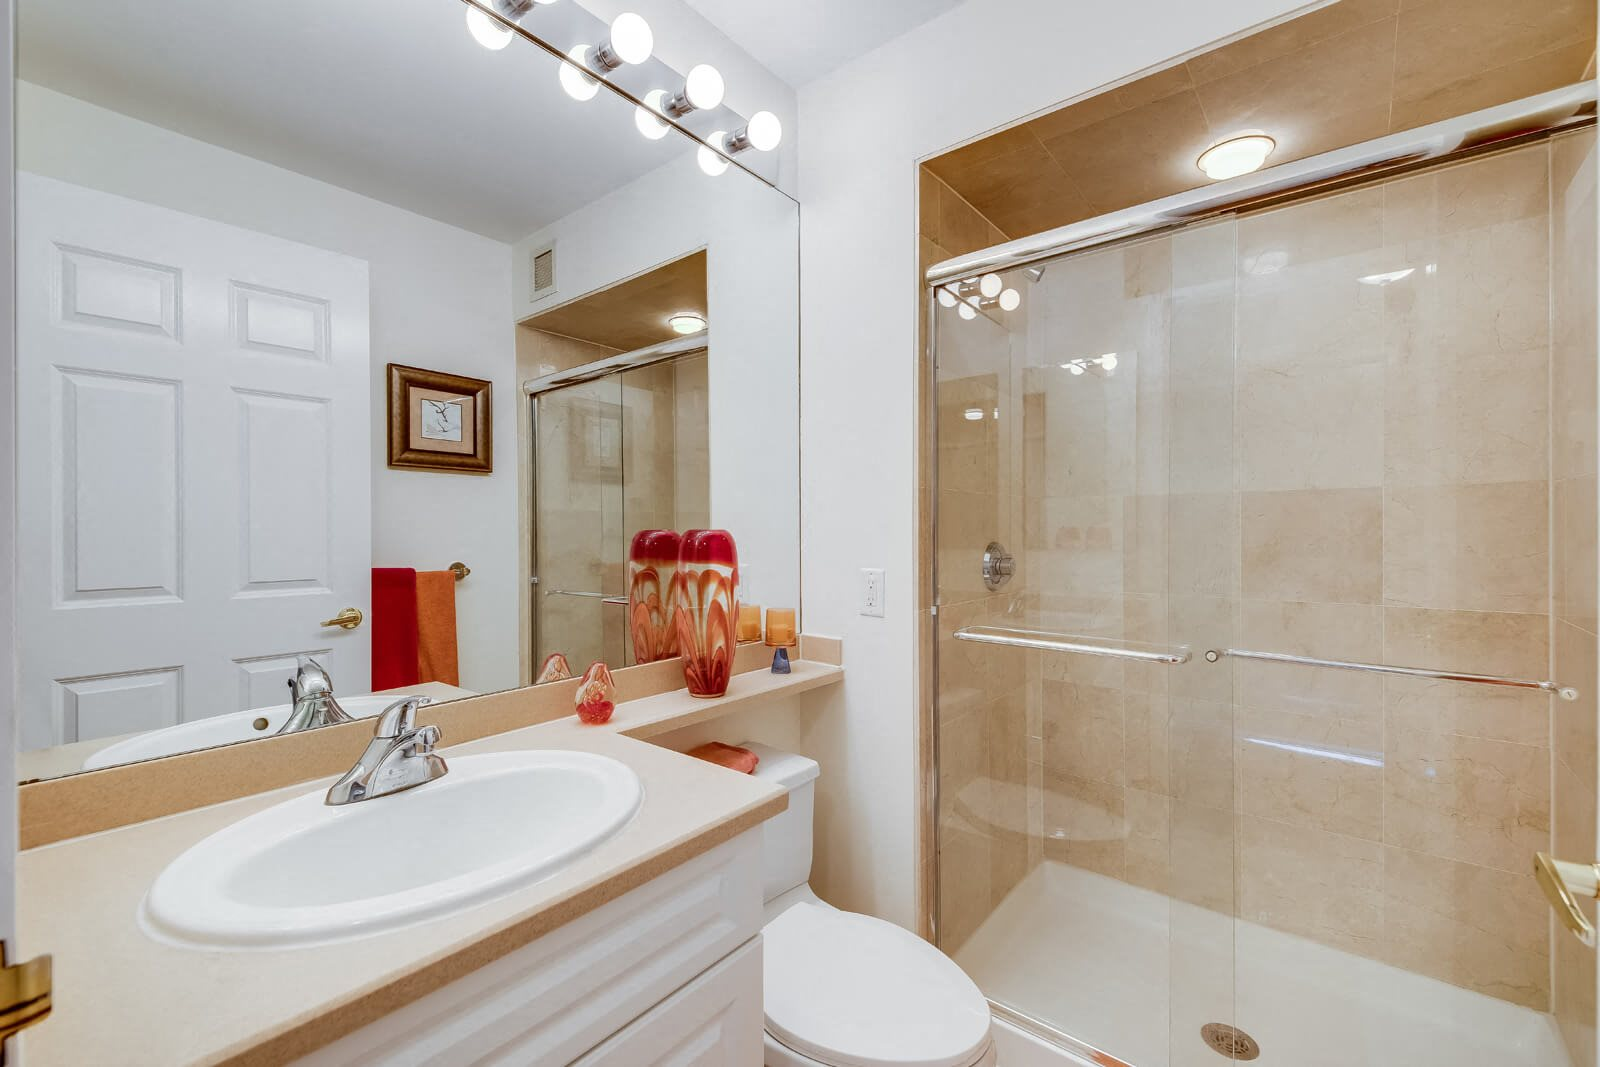 Spa-Inspired Bathrooms at Windsor at Mariners, 07020, NJ